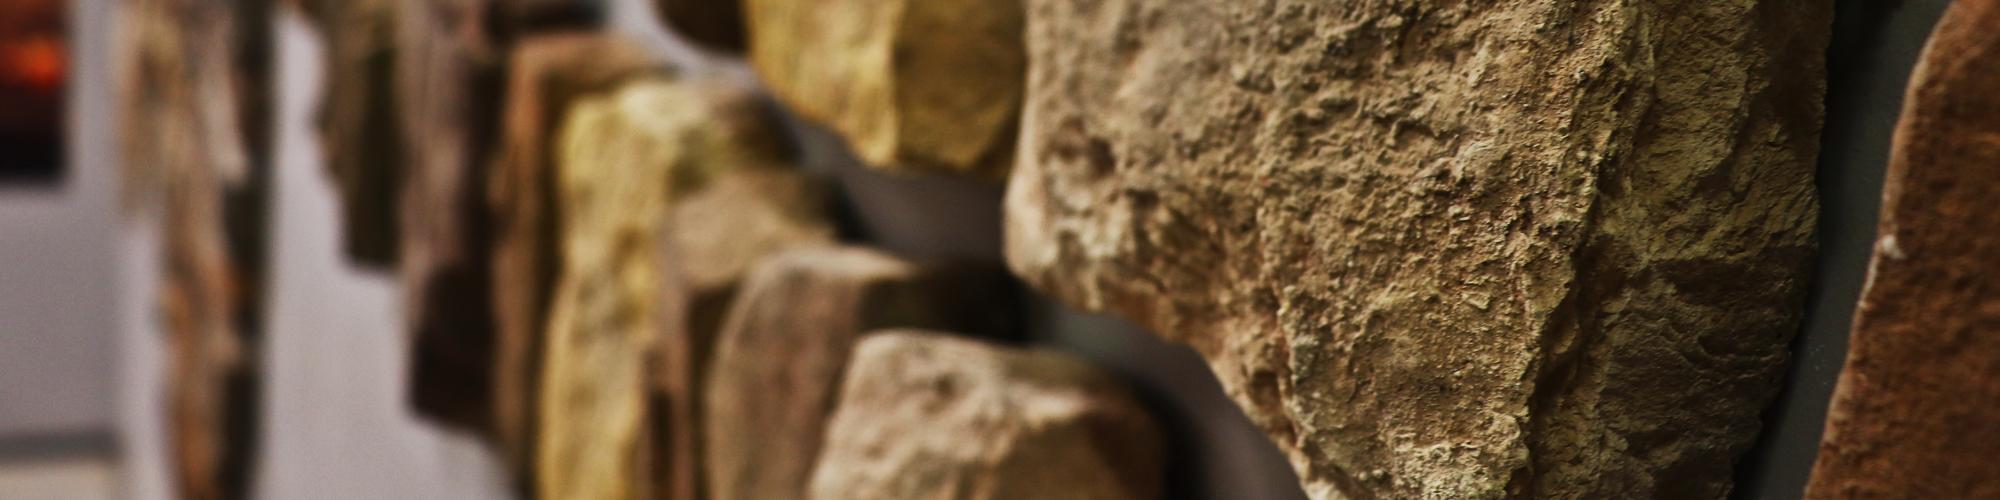 Stone cladding, exterior stone cladding, wall cladding, stone veneer